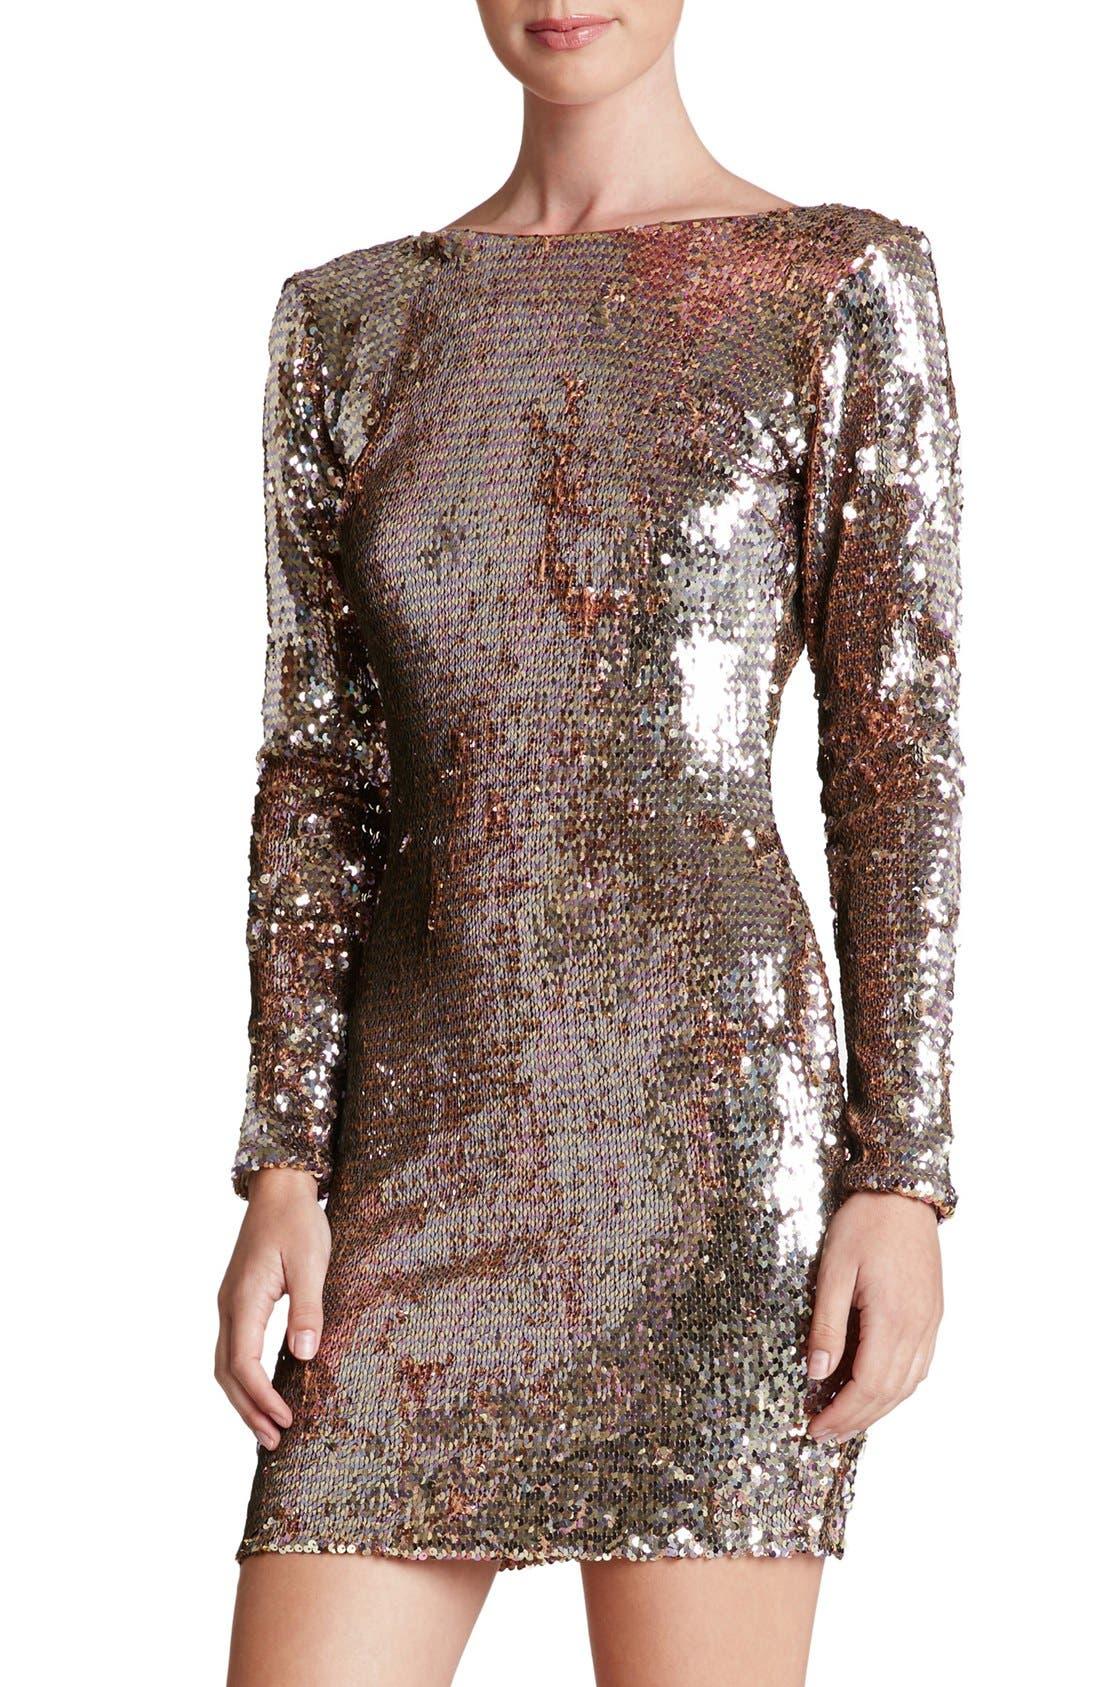 Main Image - Dress the Population 'Lola' Backless Sequin Minidress